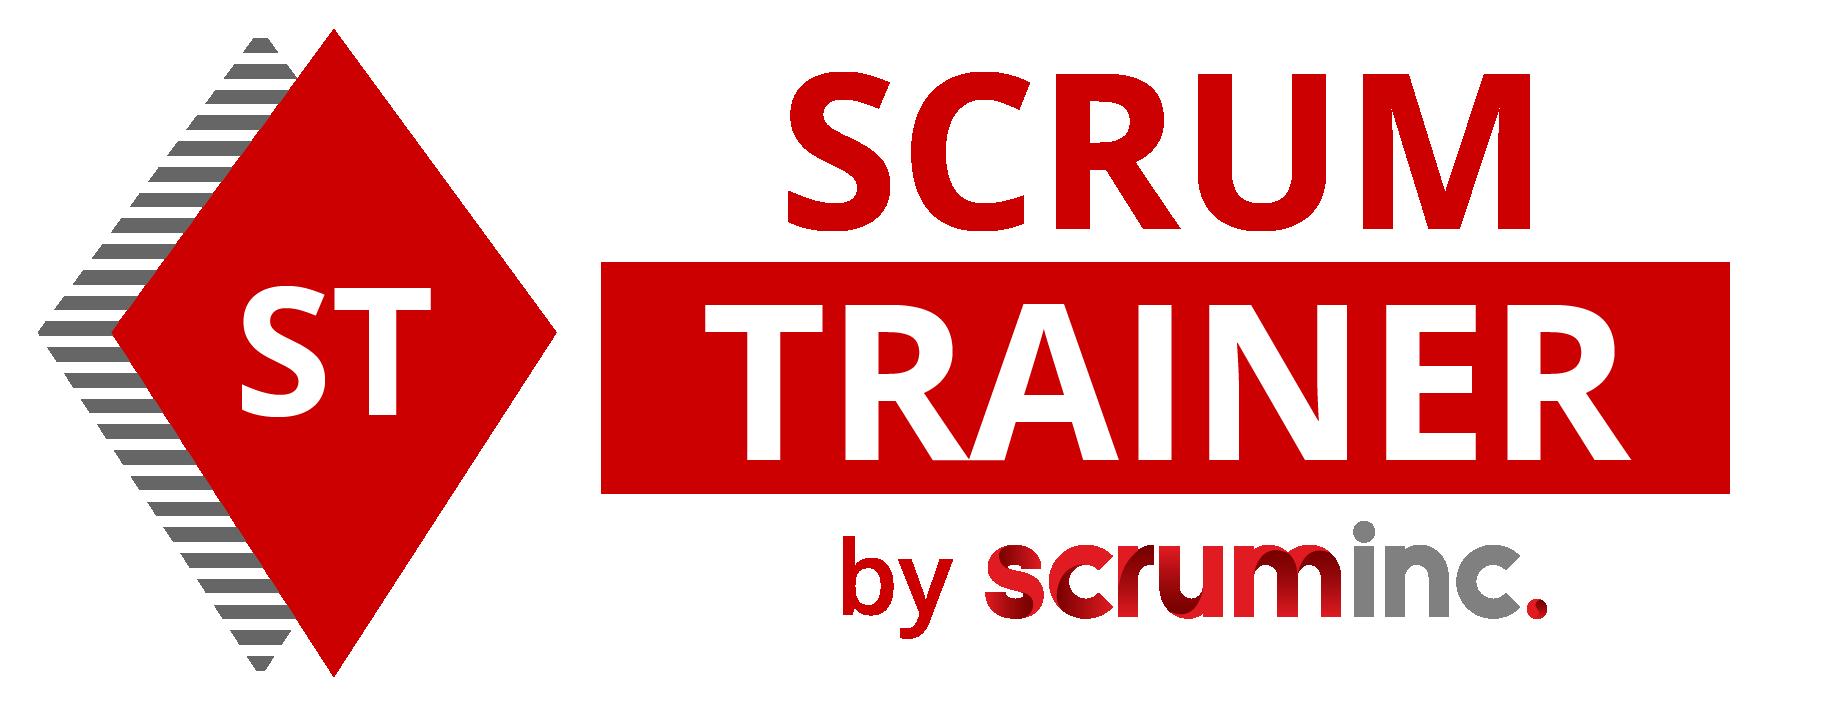 ST Scrum Trainer by scruminc